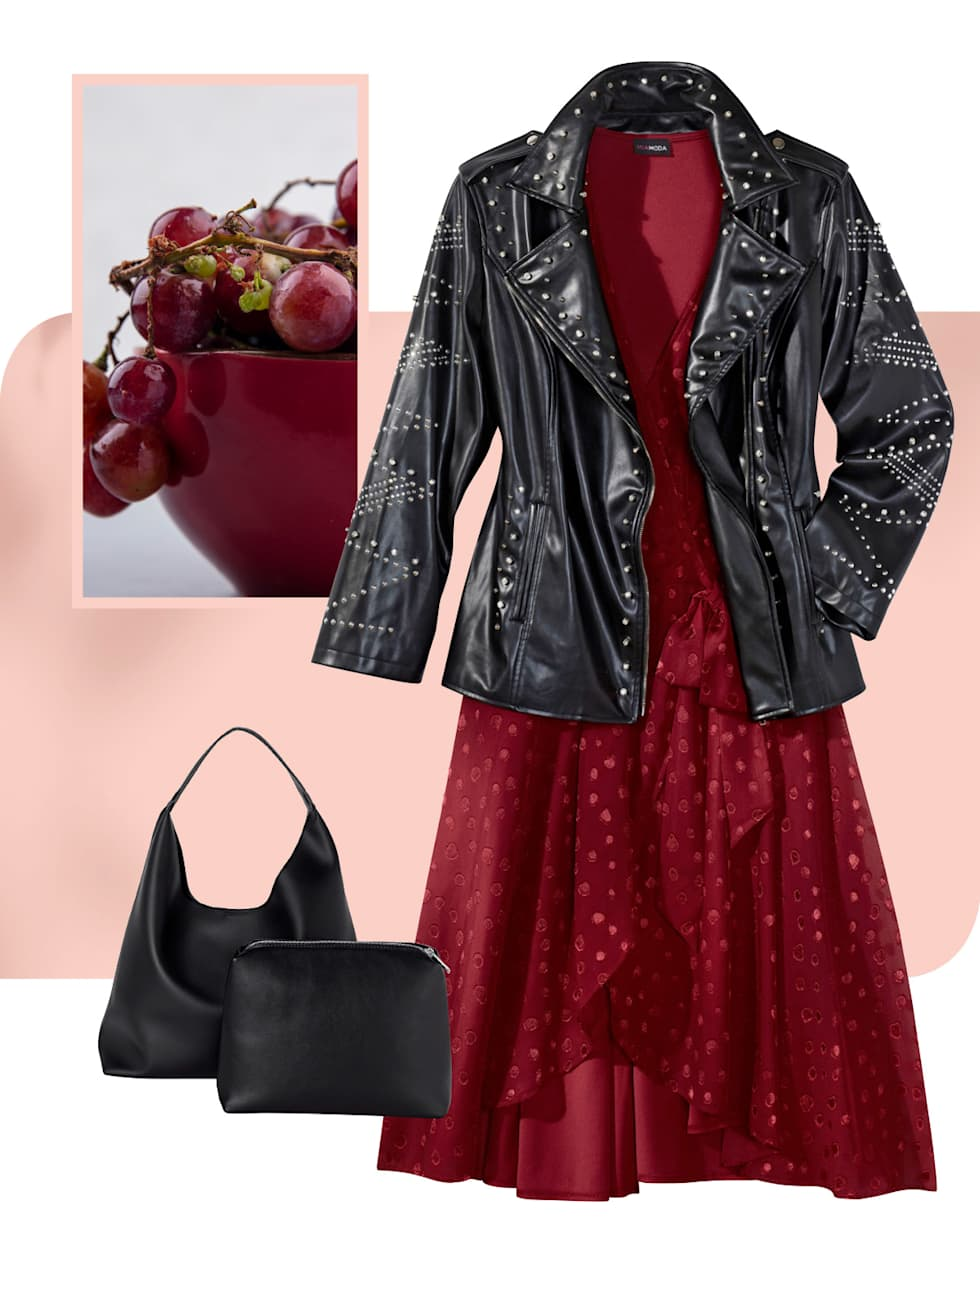 MIAMODA Große Größen Kampagne strahlende Farben - Outfit in der Farbe rot